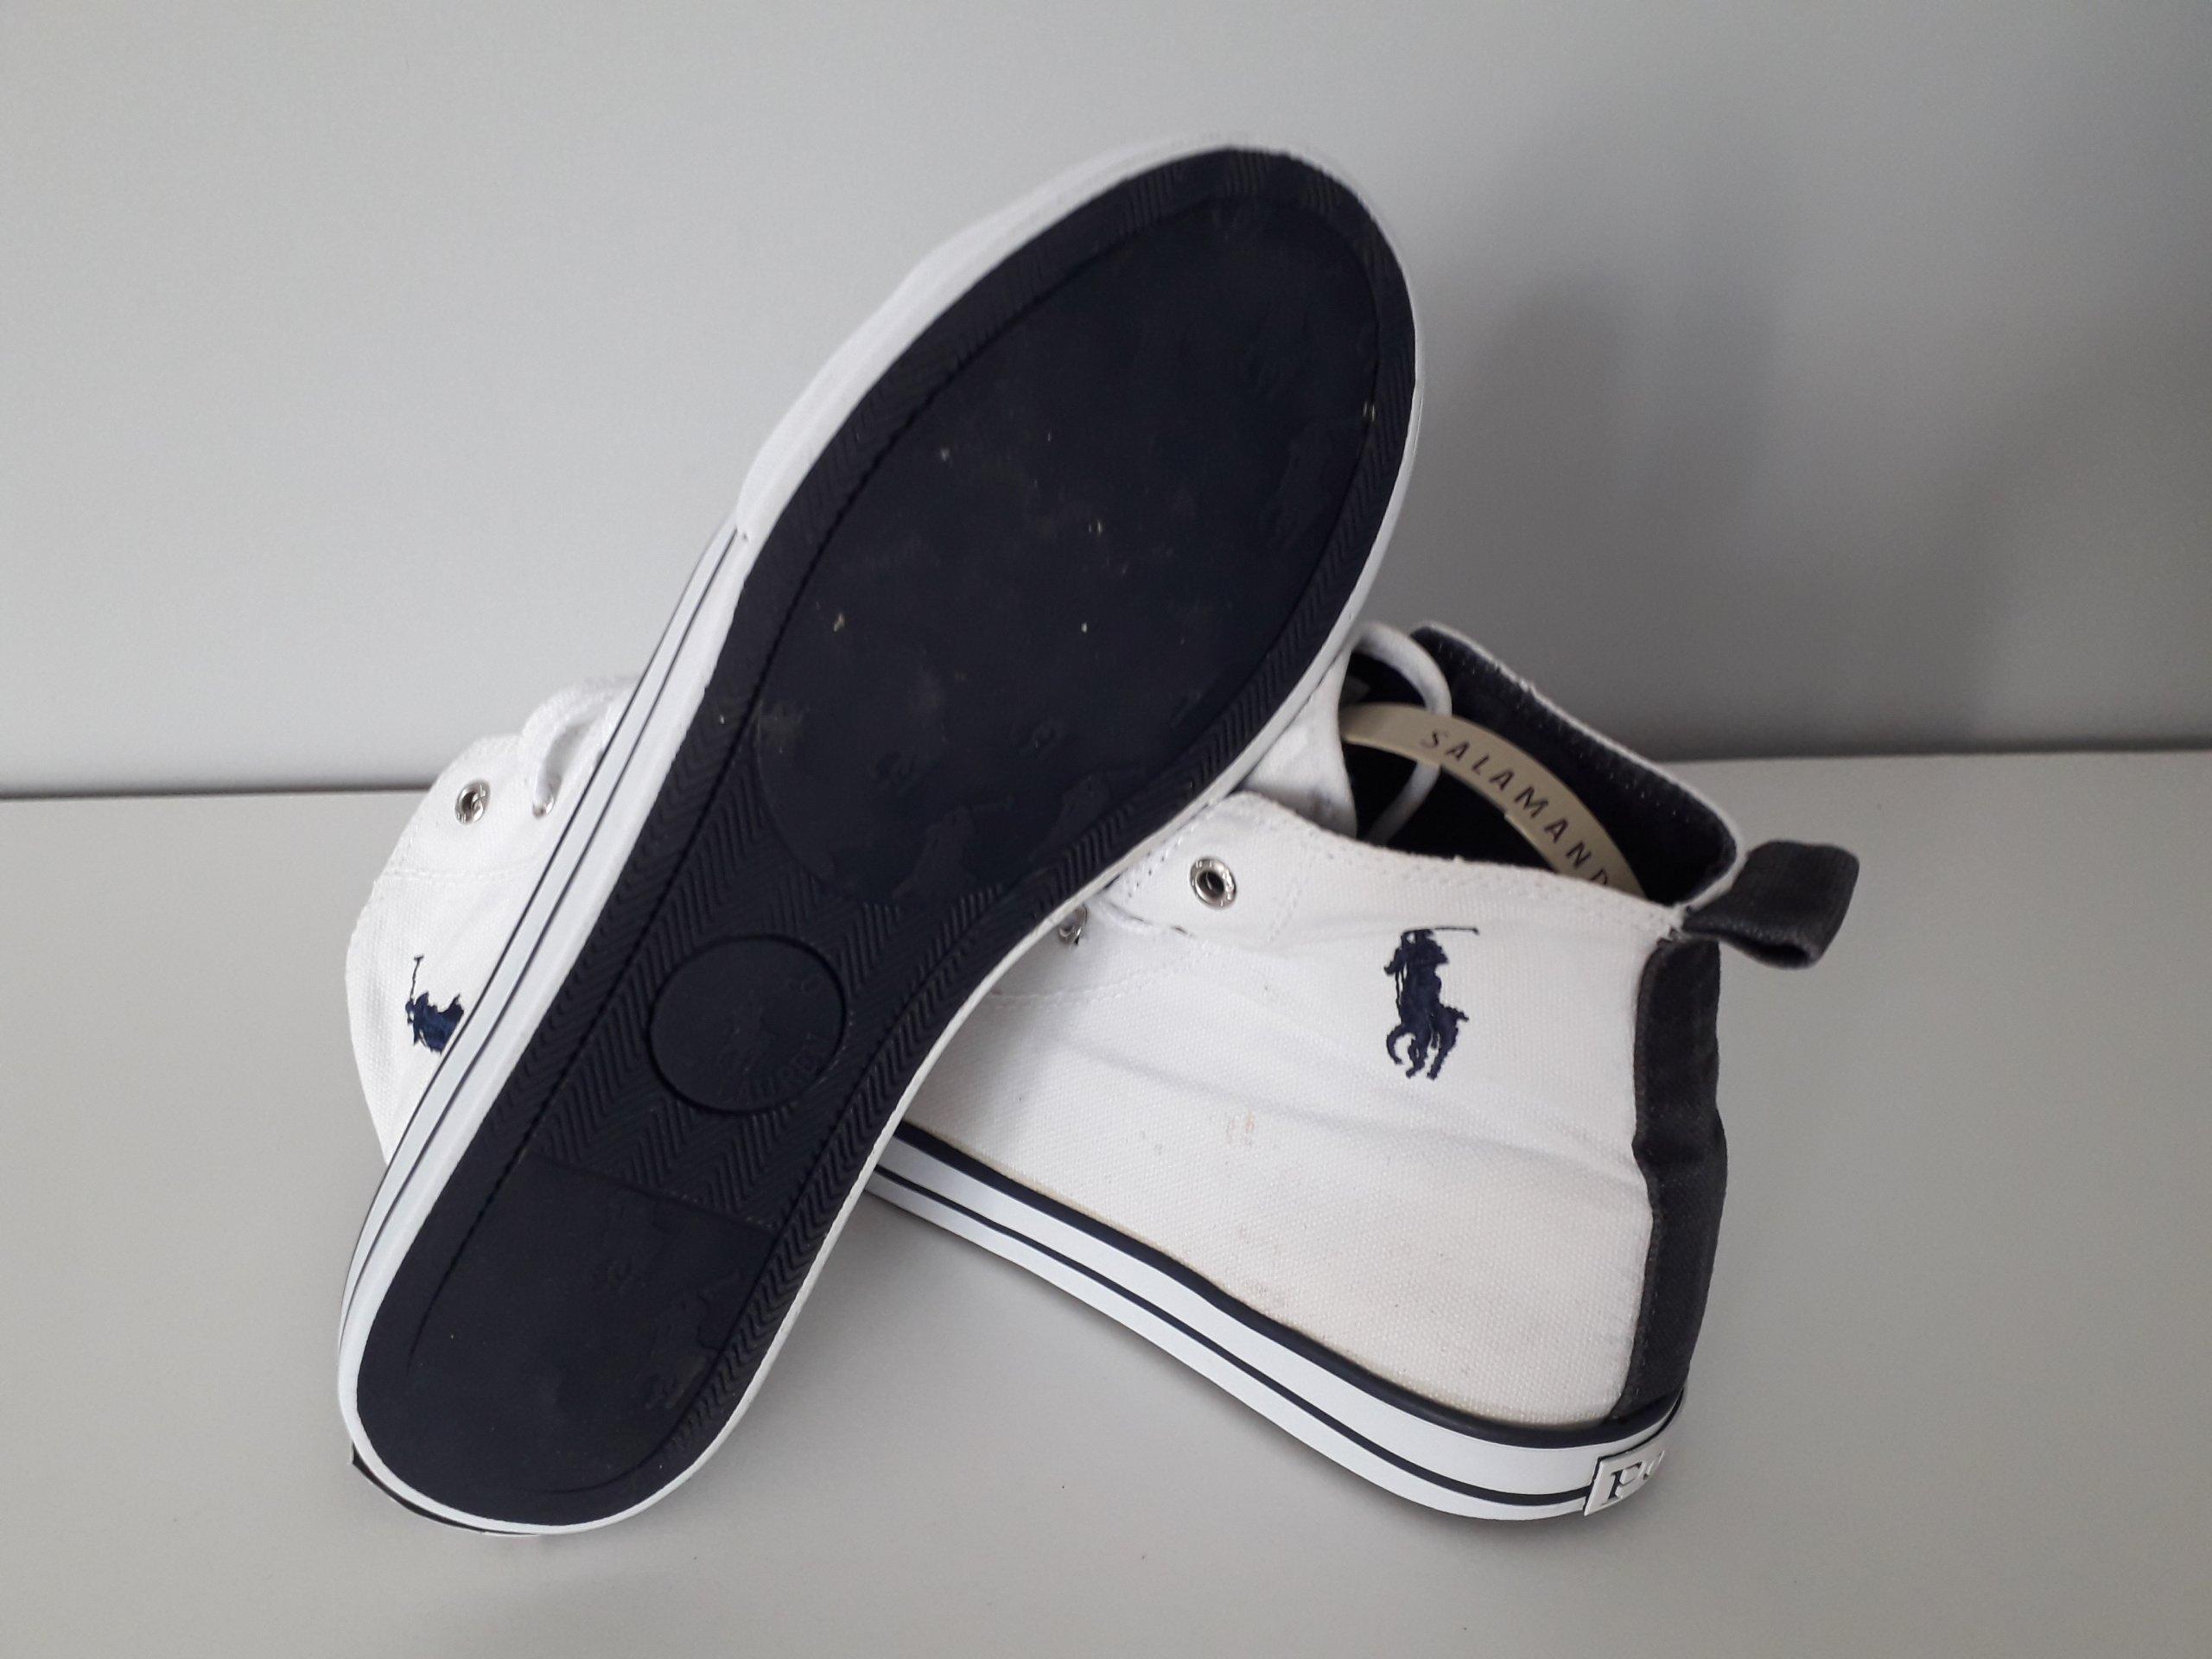 521628dc2f8ff POLO RALPH LAUREN damskie buty trampki okazja r.38 - 7408803246 ...